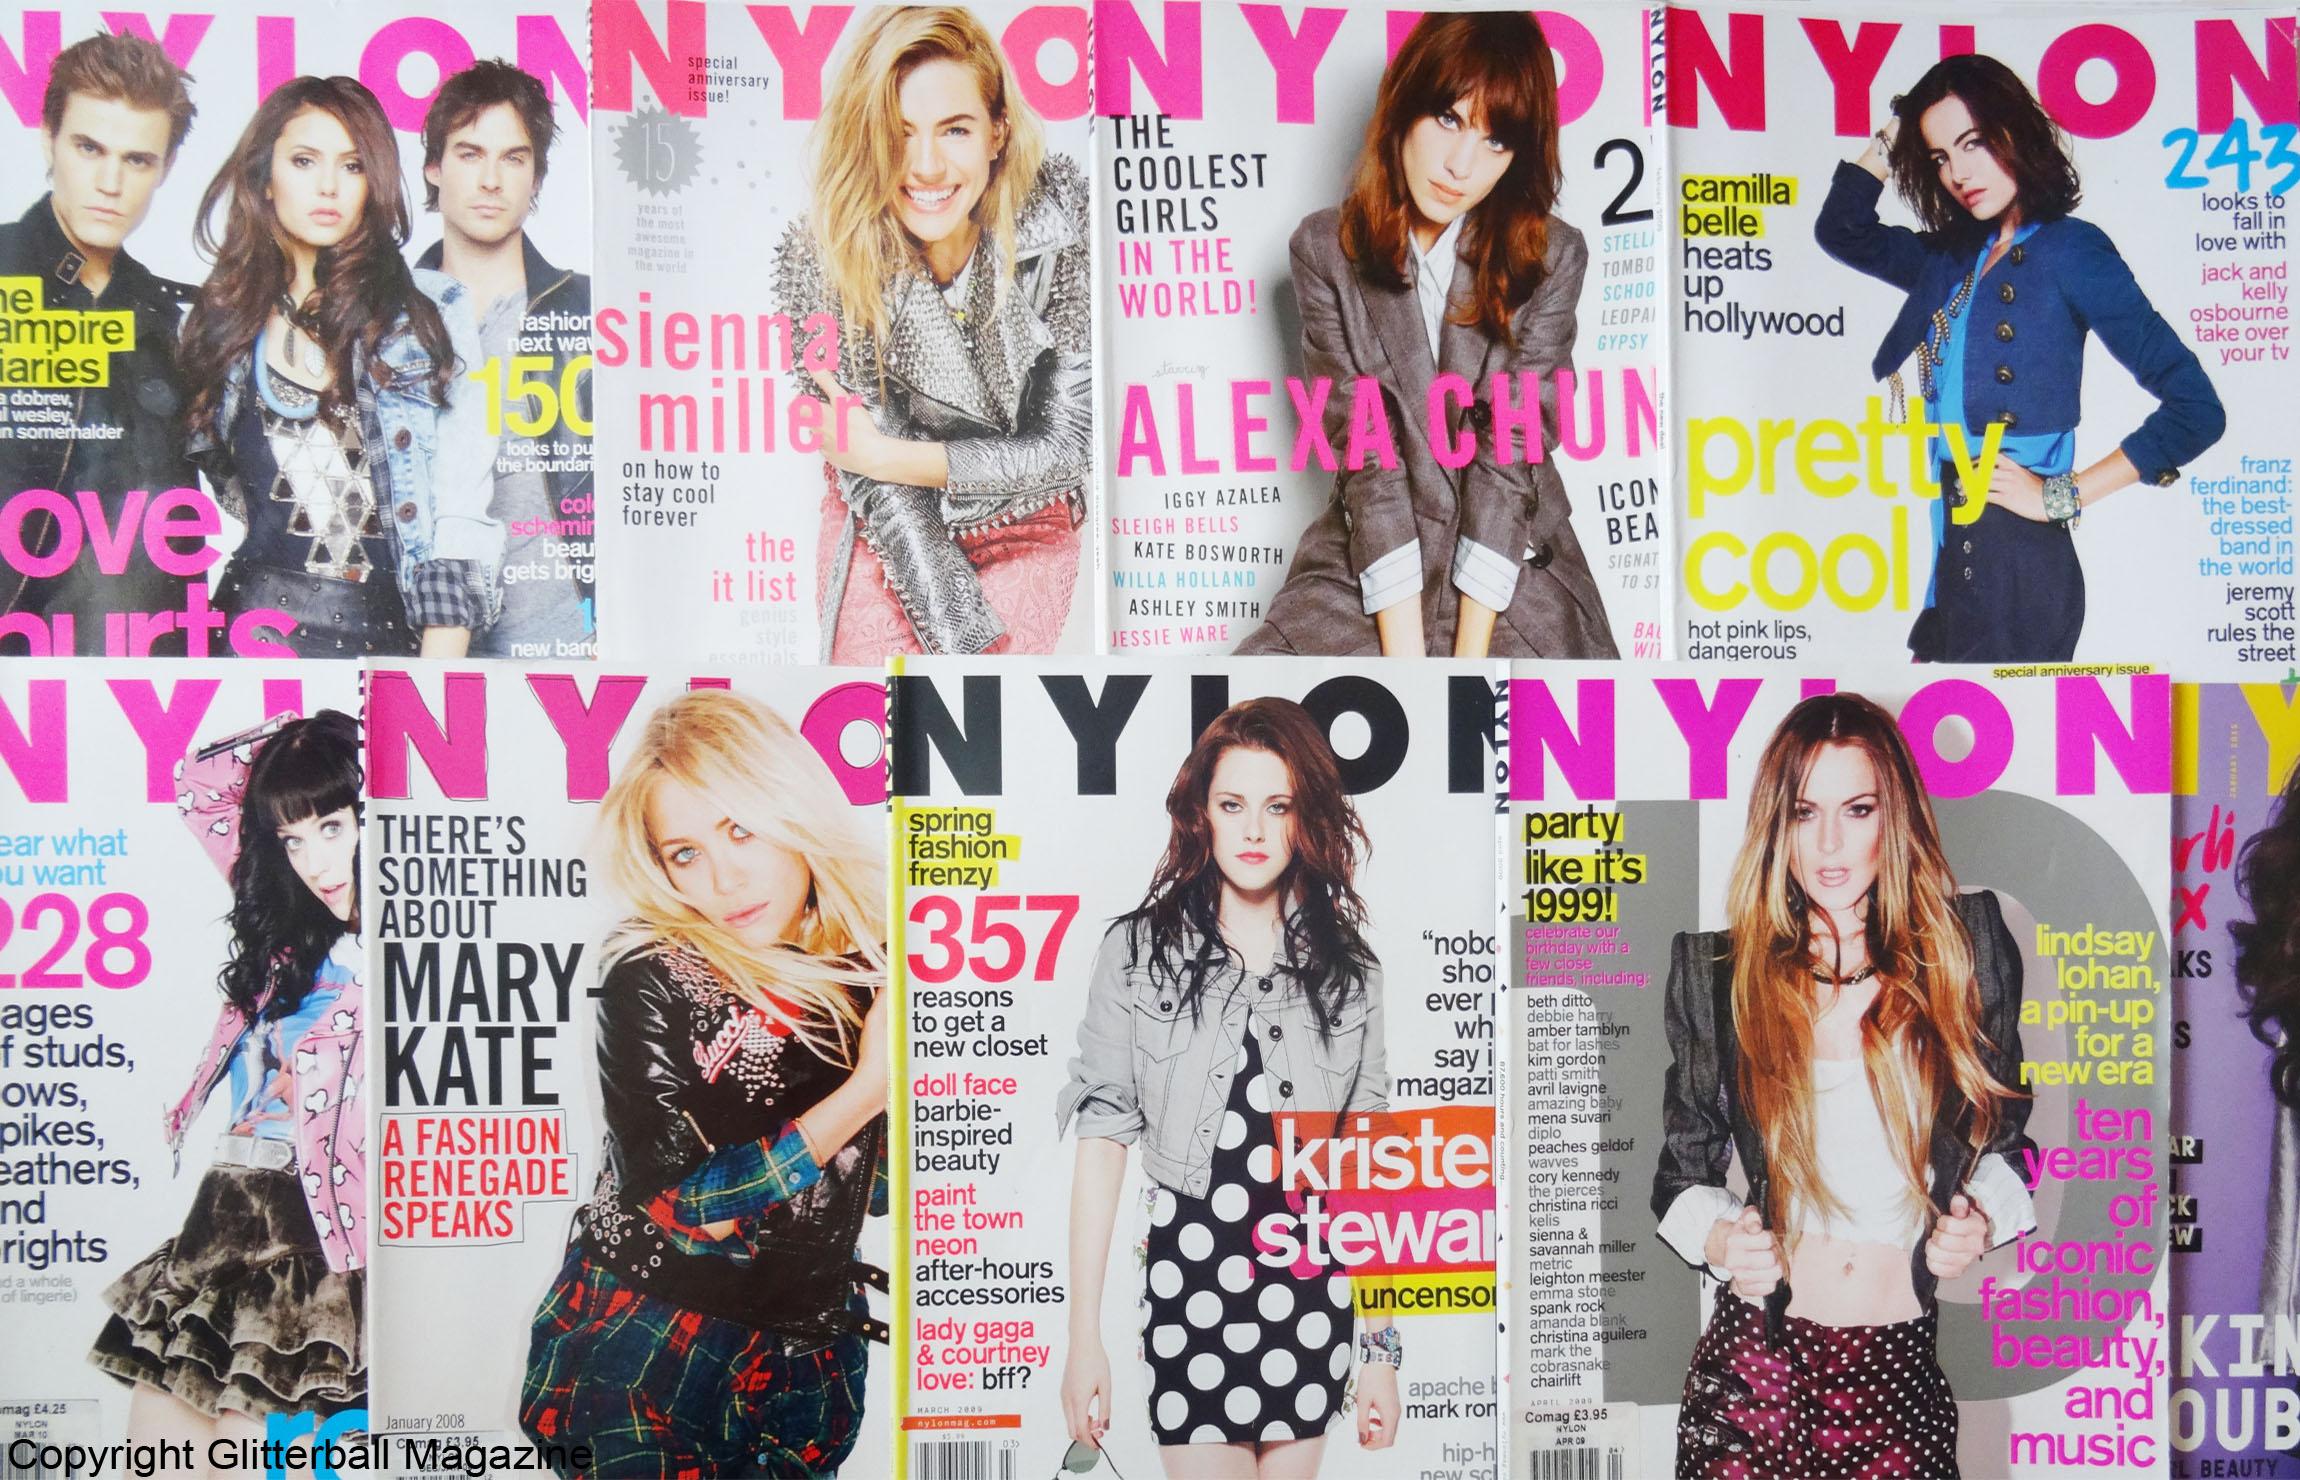 FAREWELL NYLON MAGAZINE: NYLON ENDING PRINT EDITIONS